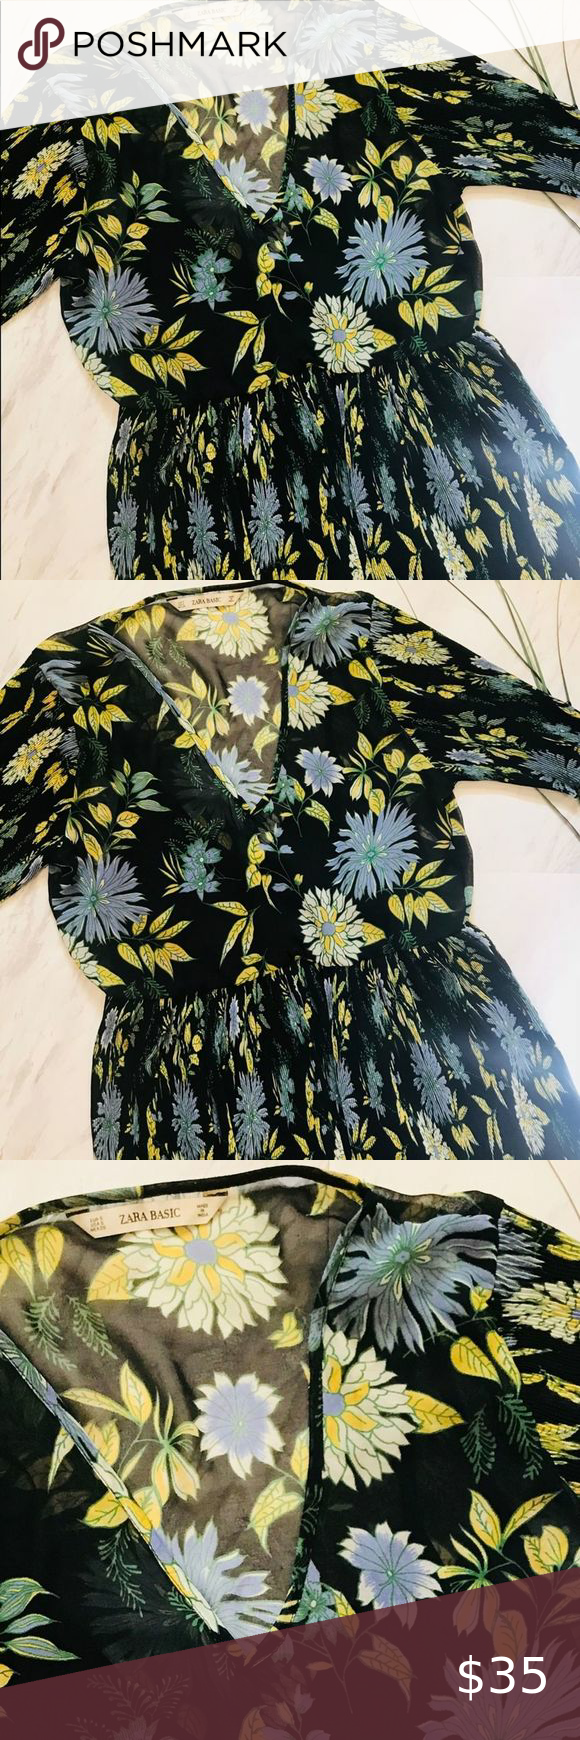 Zara Basic Floral Dress Description Beautiful Black Floral Dress With Touches Of Blue Green And Yellow Fl Long Sleeve Mini Dress Zara Basic Mini Slip Dress [ 1740 x 580 Pixel ]